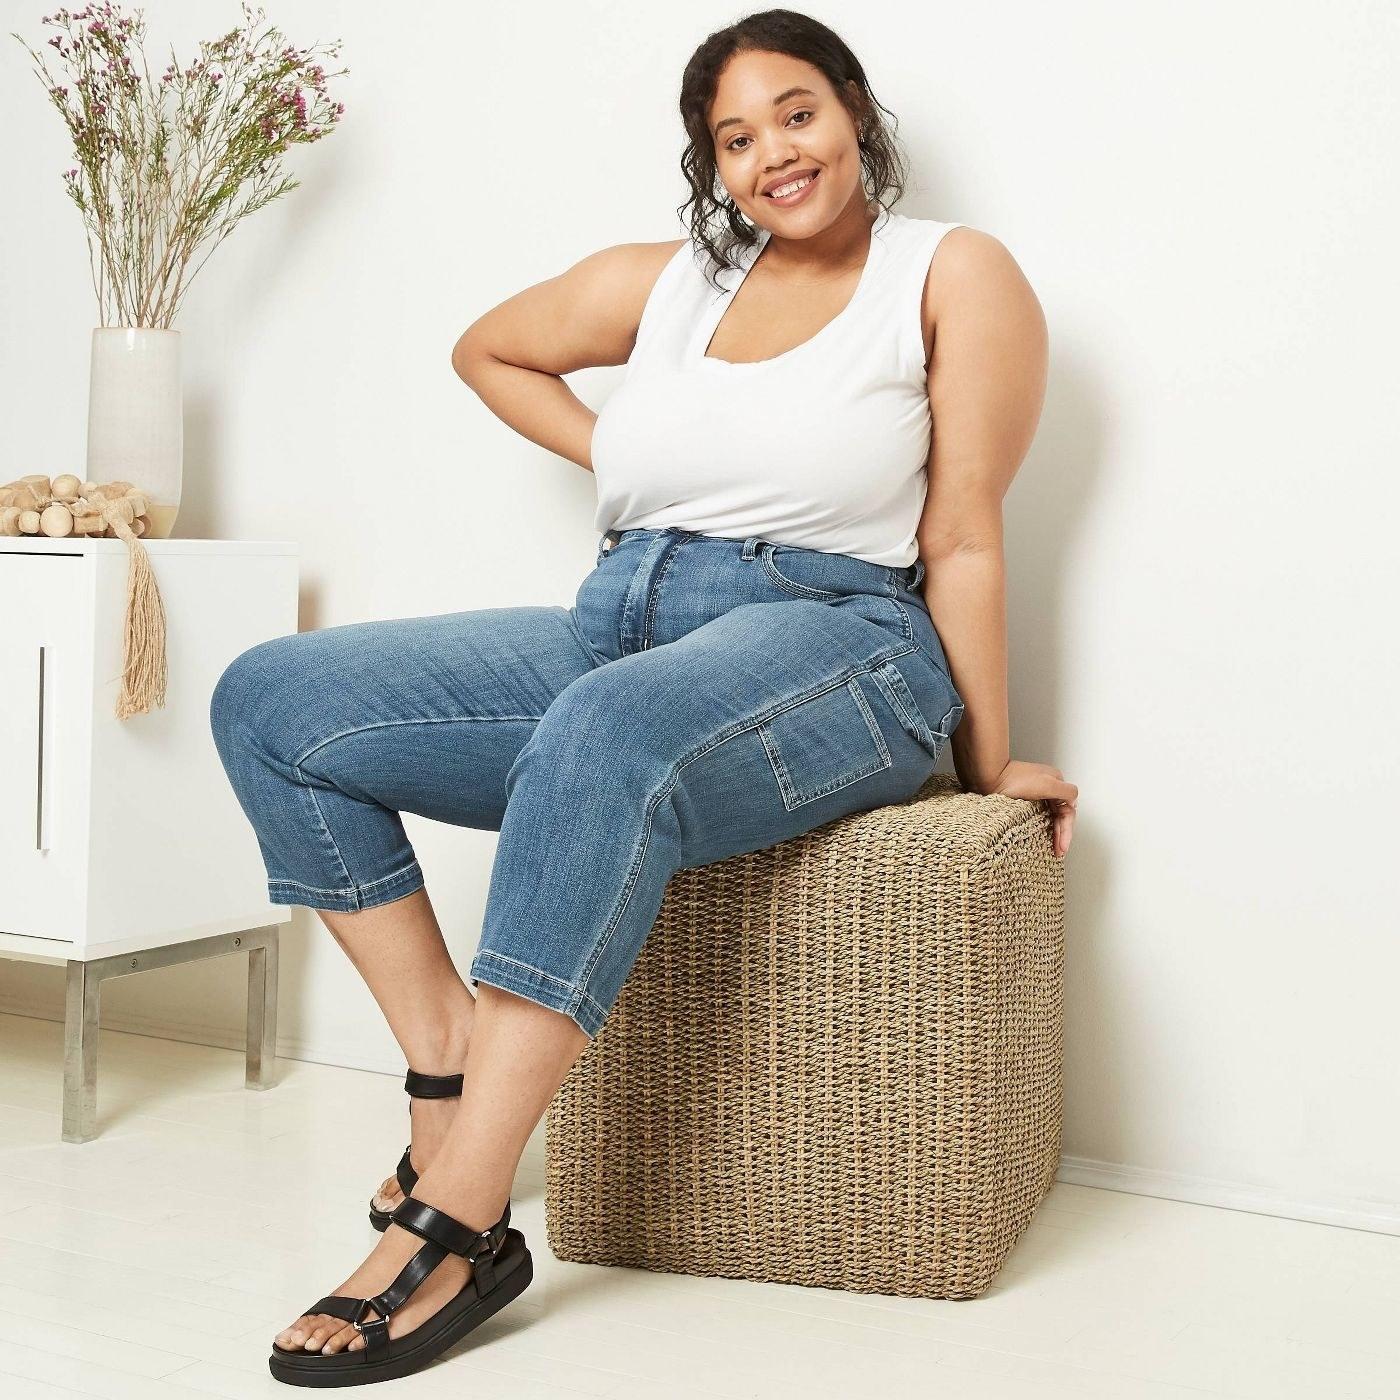 Model wearing carpenter jeans